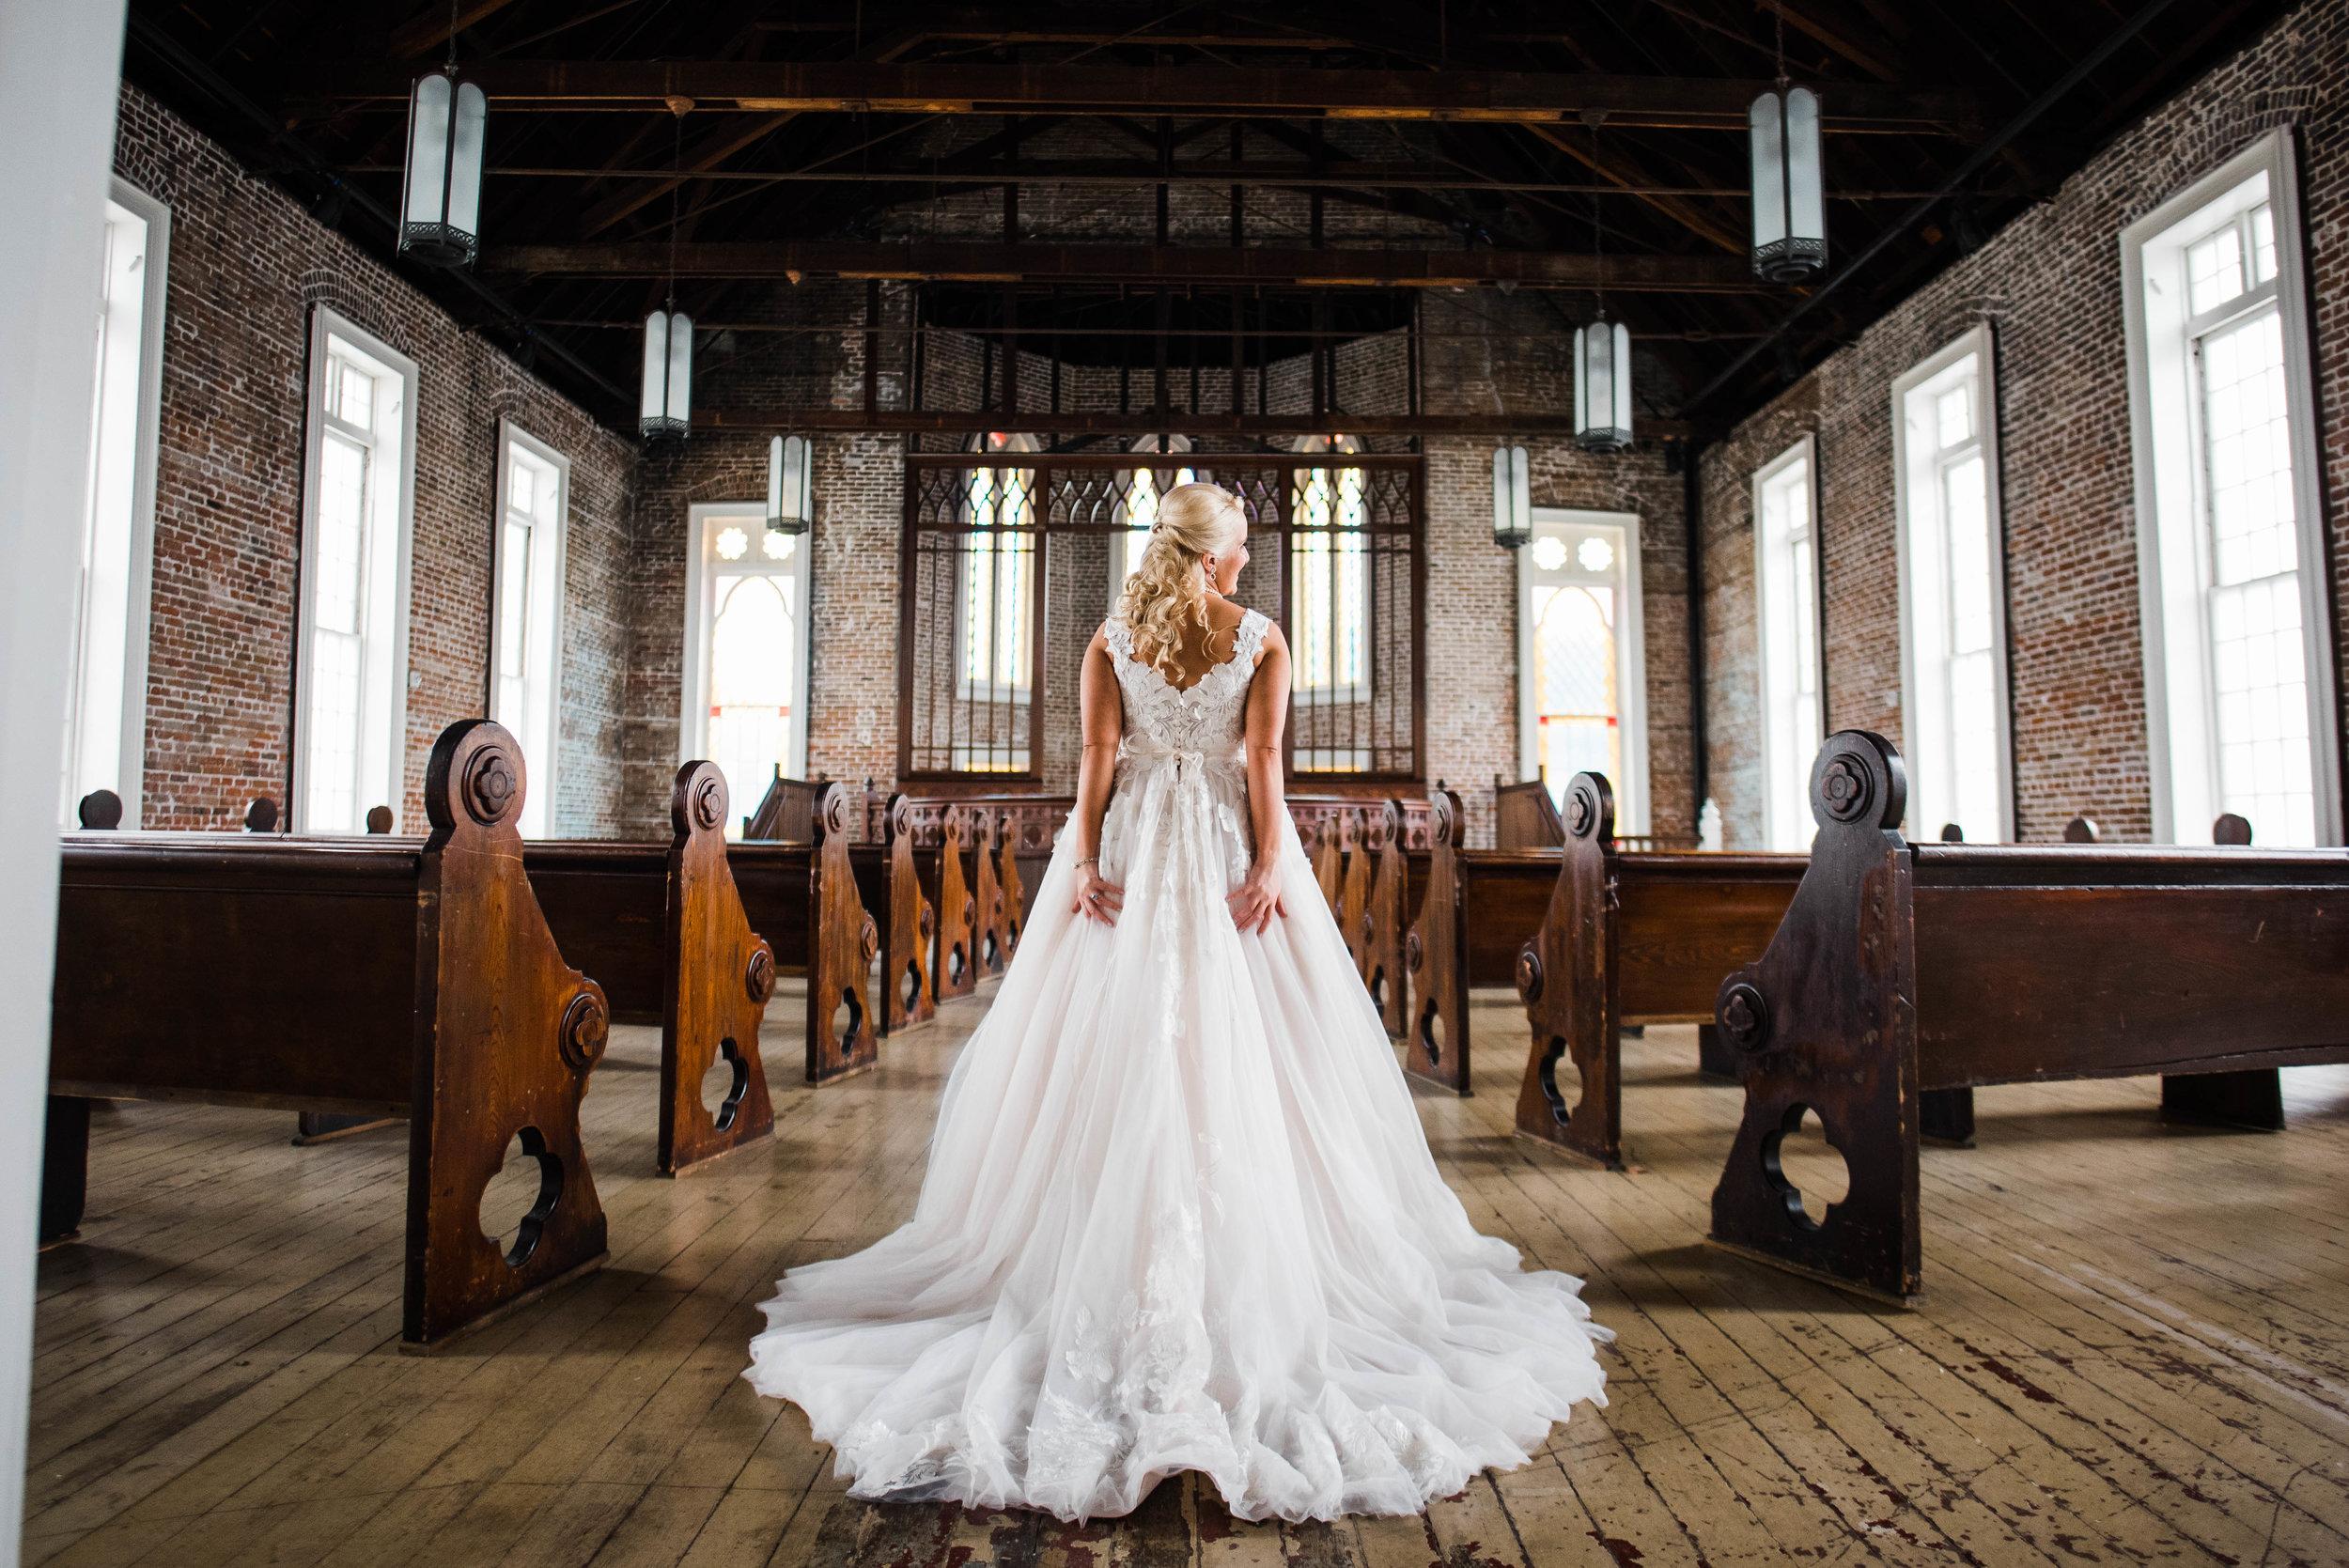 Kate-Felicity-Church-Bridal-Portraits_Gabby Chapin_Photography_Originals_00777.jpg